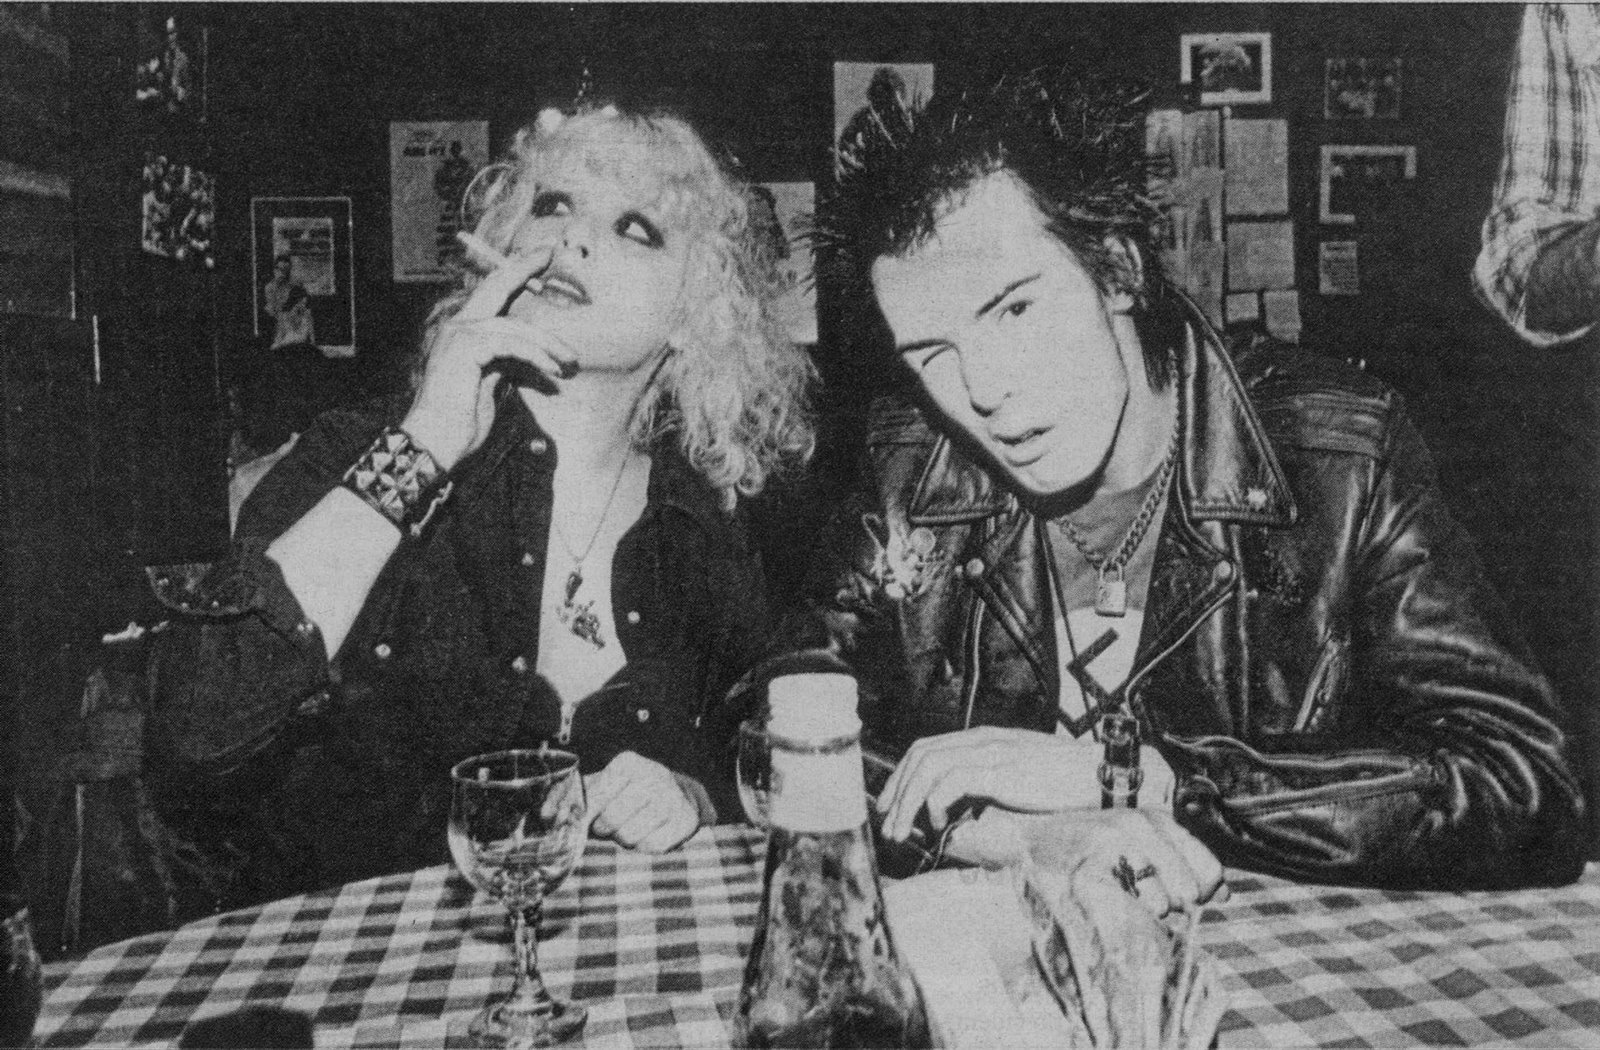 Punk um 1980